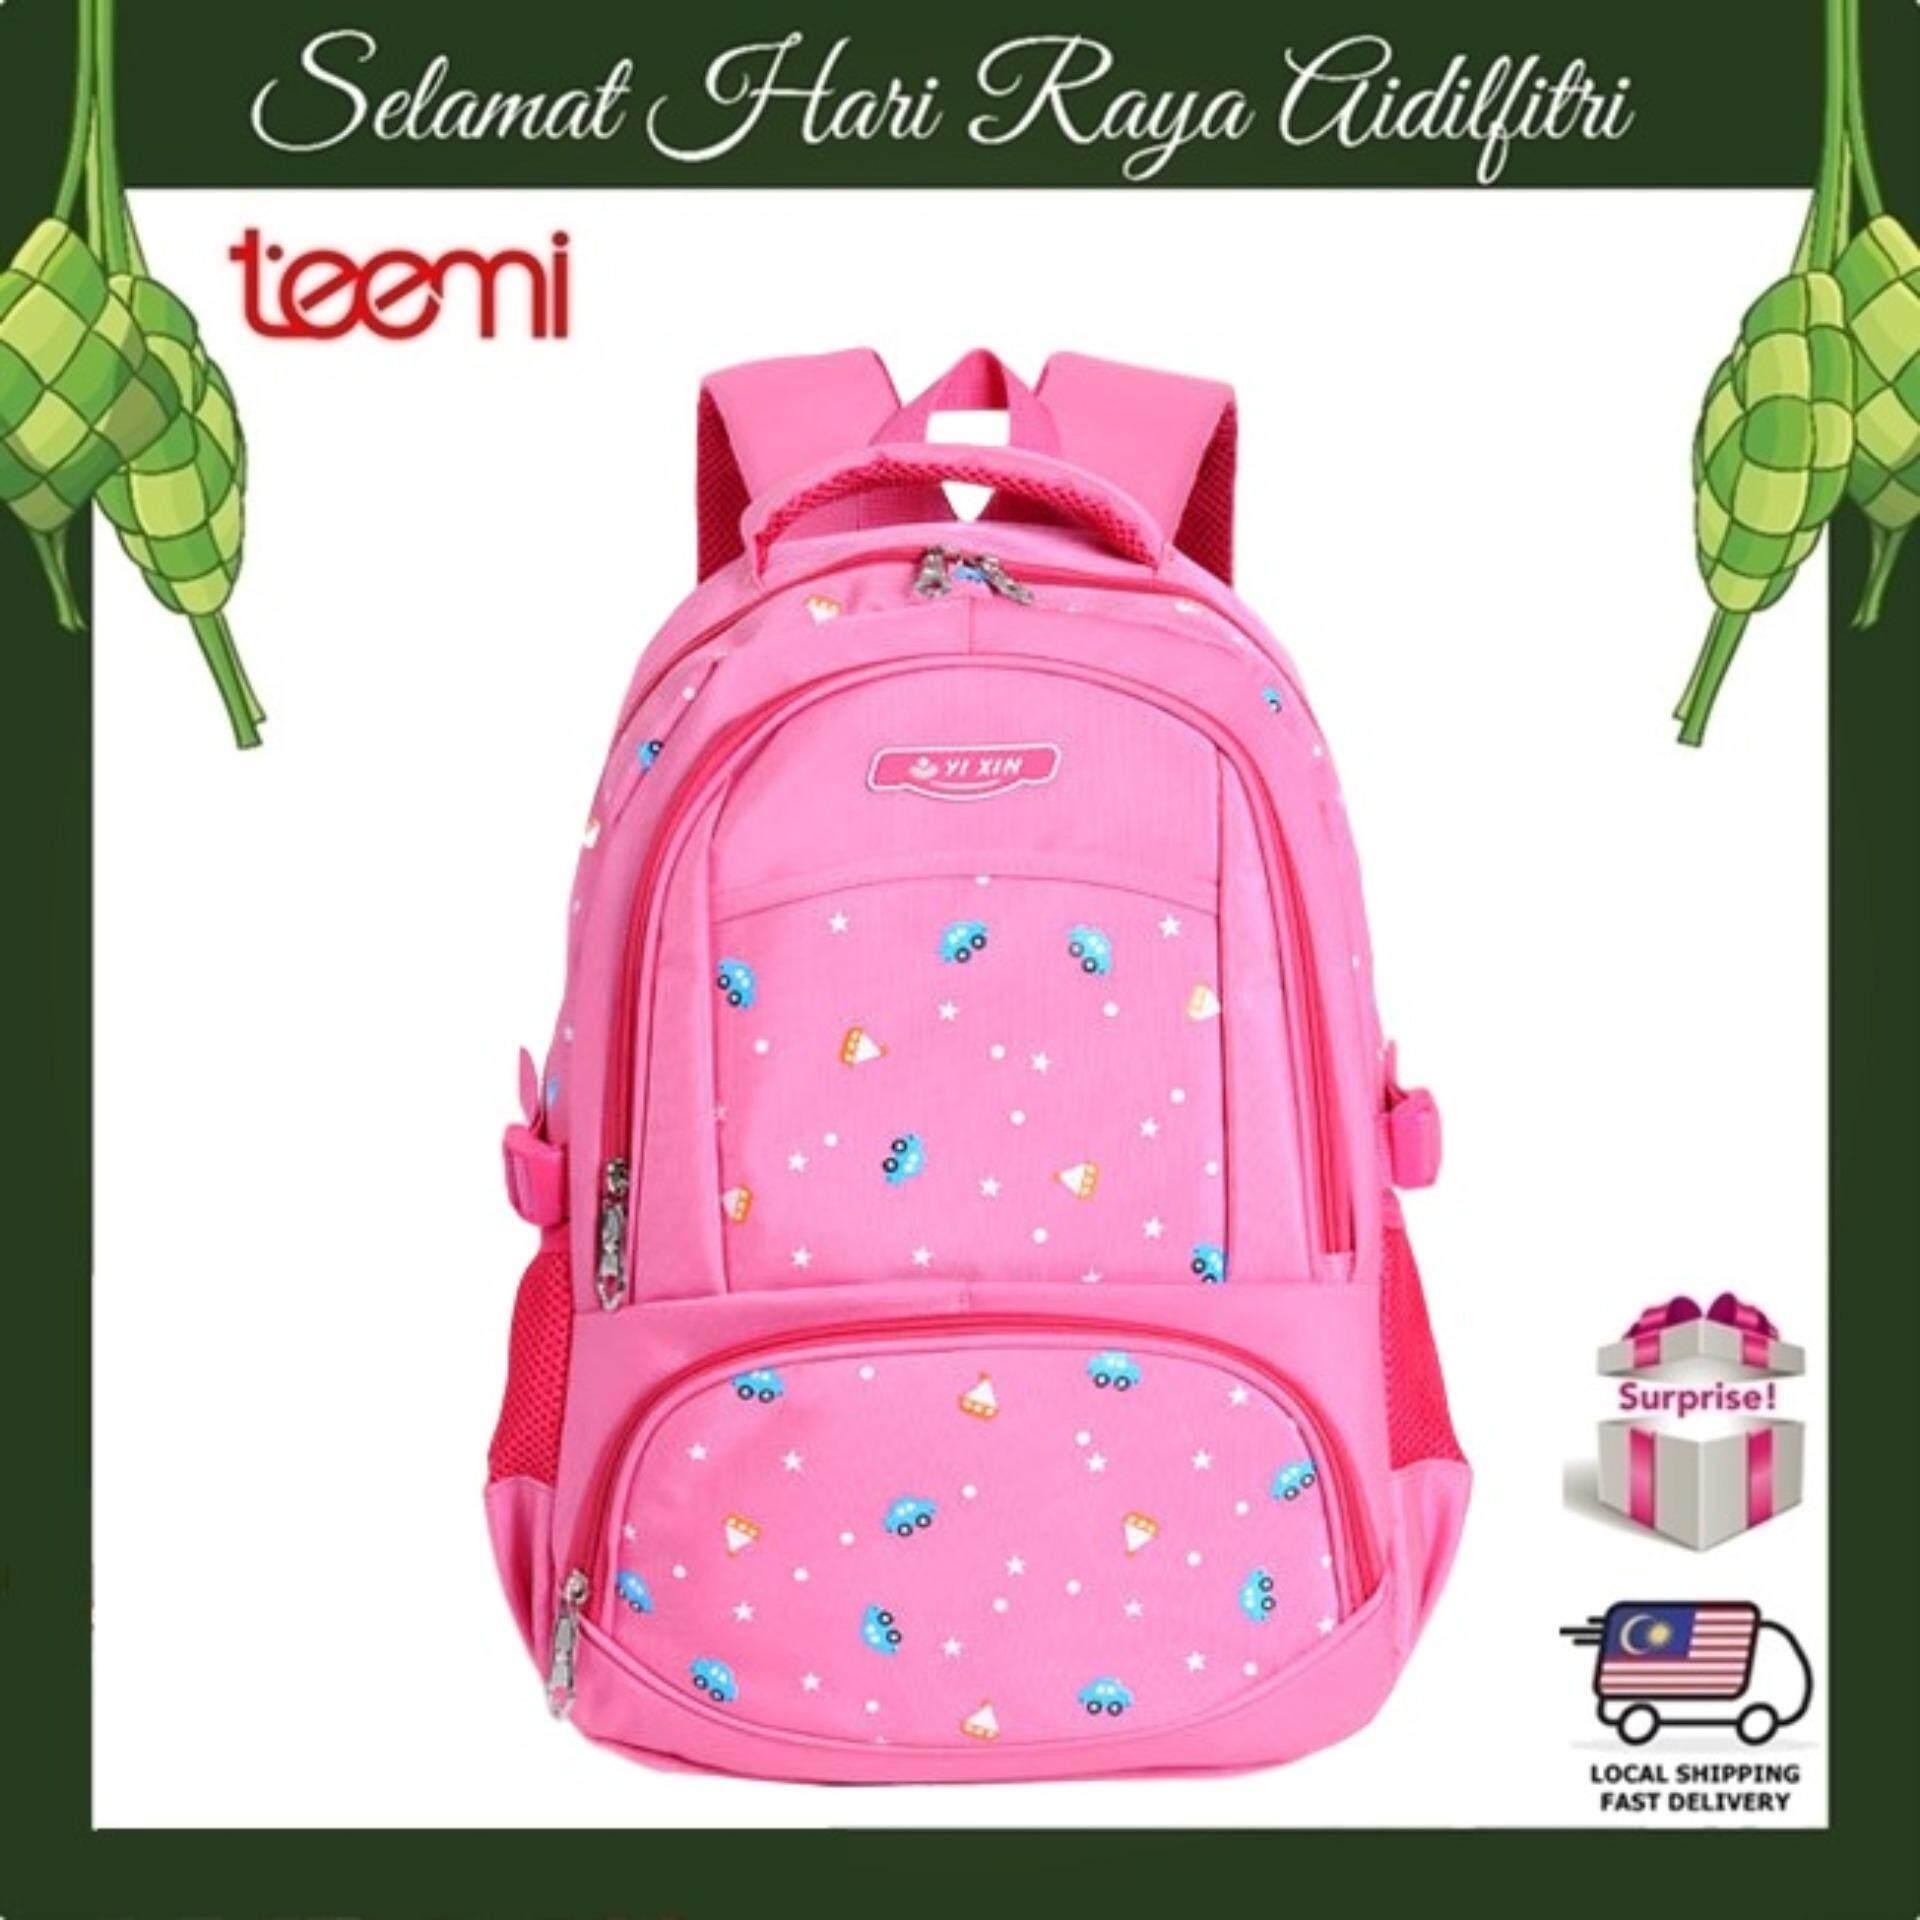 【TEEMI】 Girls Candy Color Primary Secondary Water Resistant Girlish Ergonomic Orthopedic School Bag Kids Children Laptop Backpack - Pink